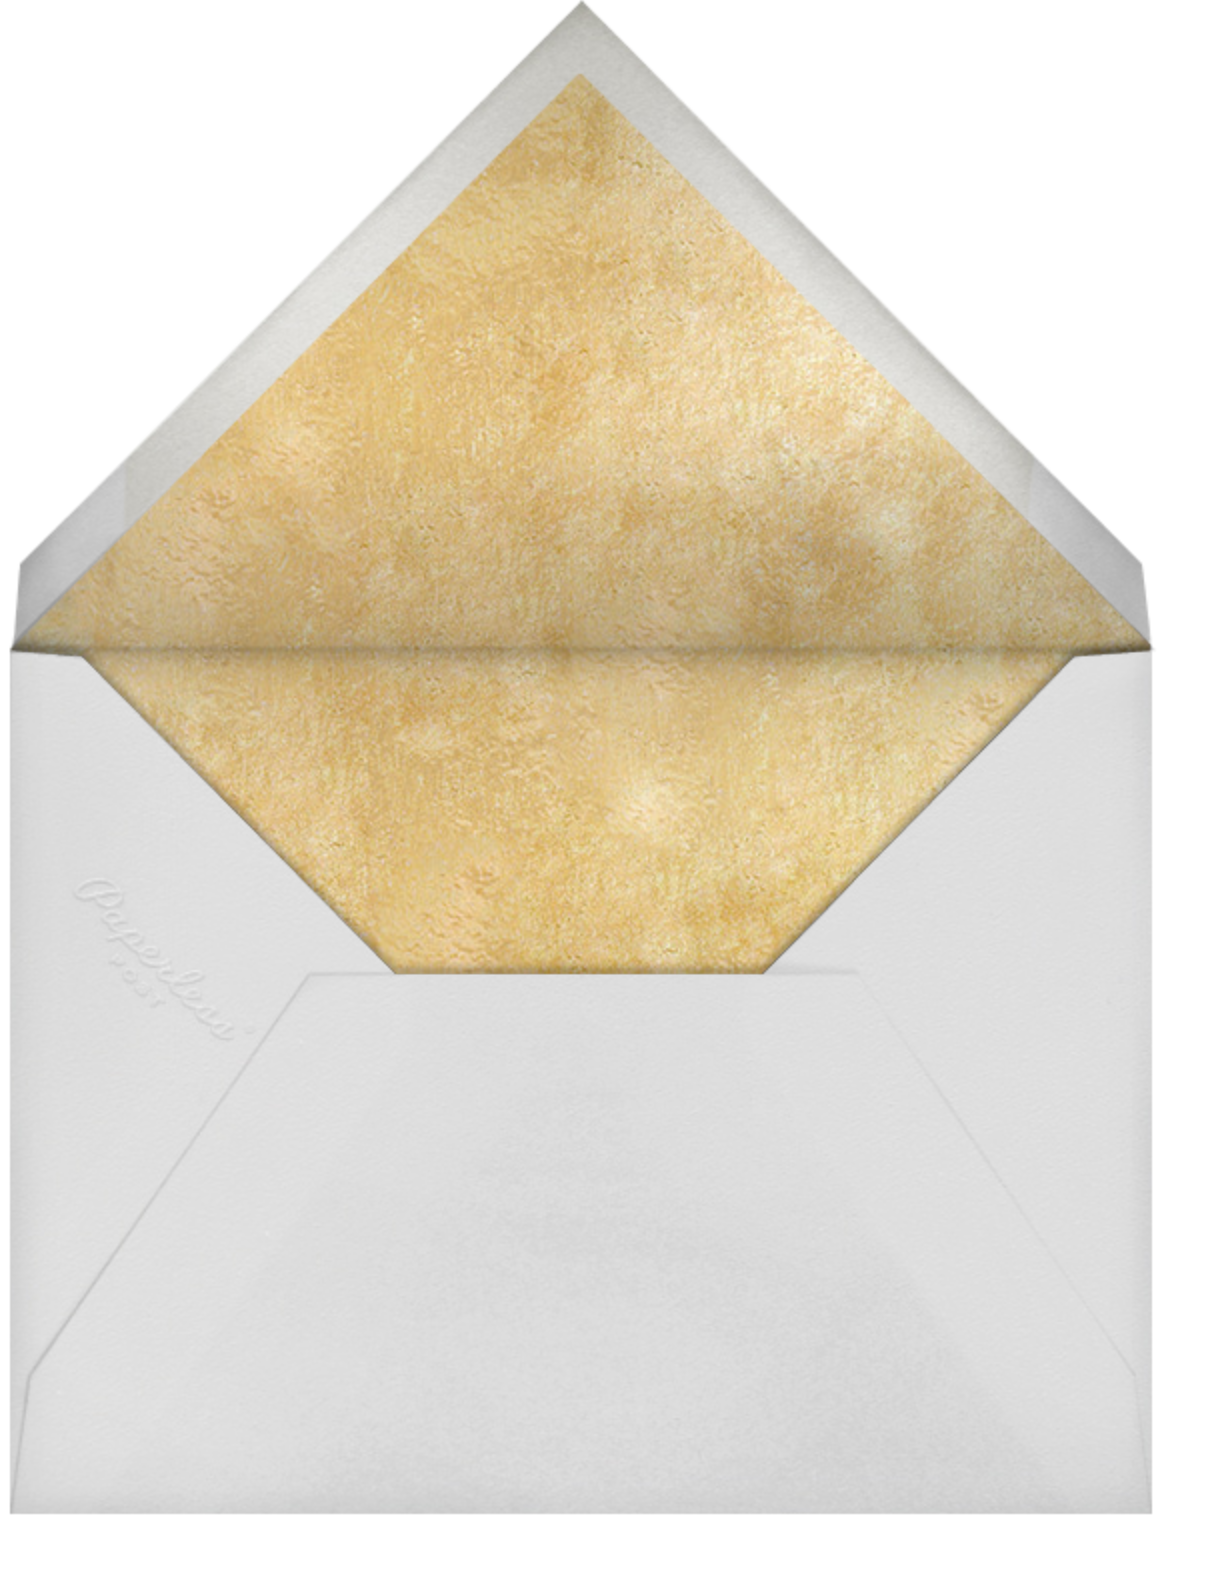 Ellis Hall II (Stationery) - Navy - kate spade new york - Envelope